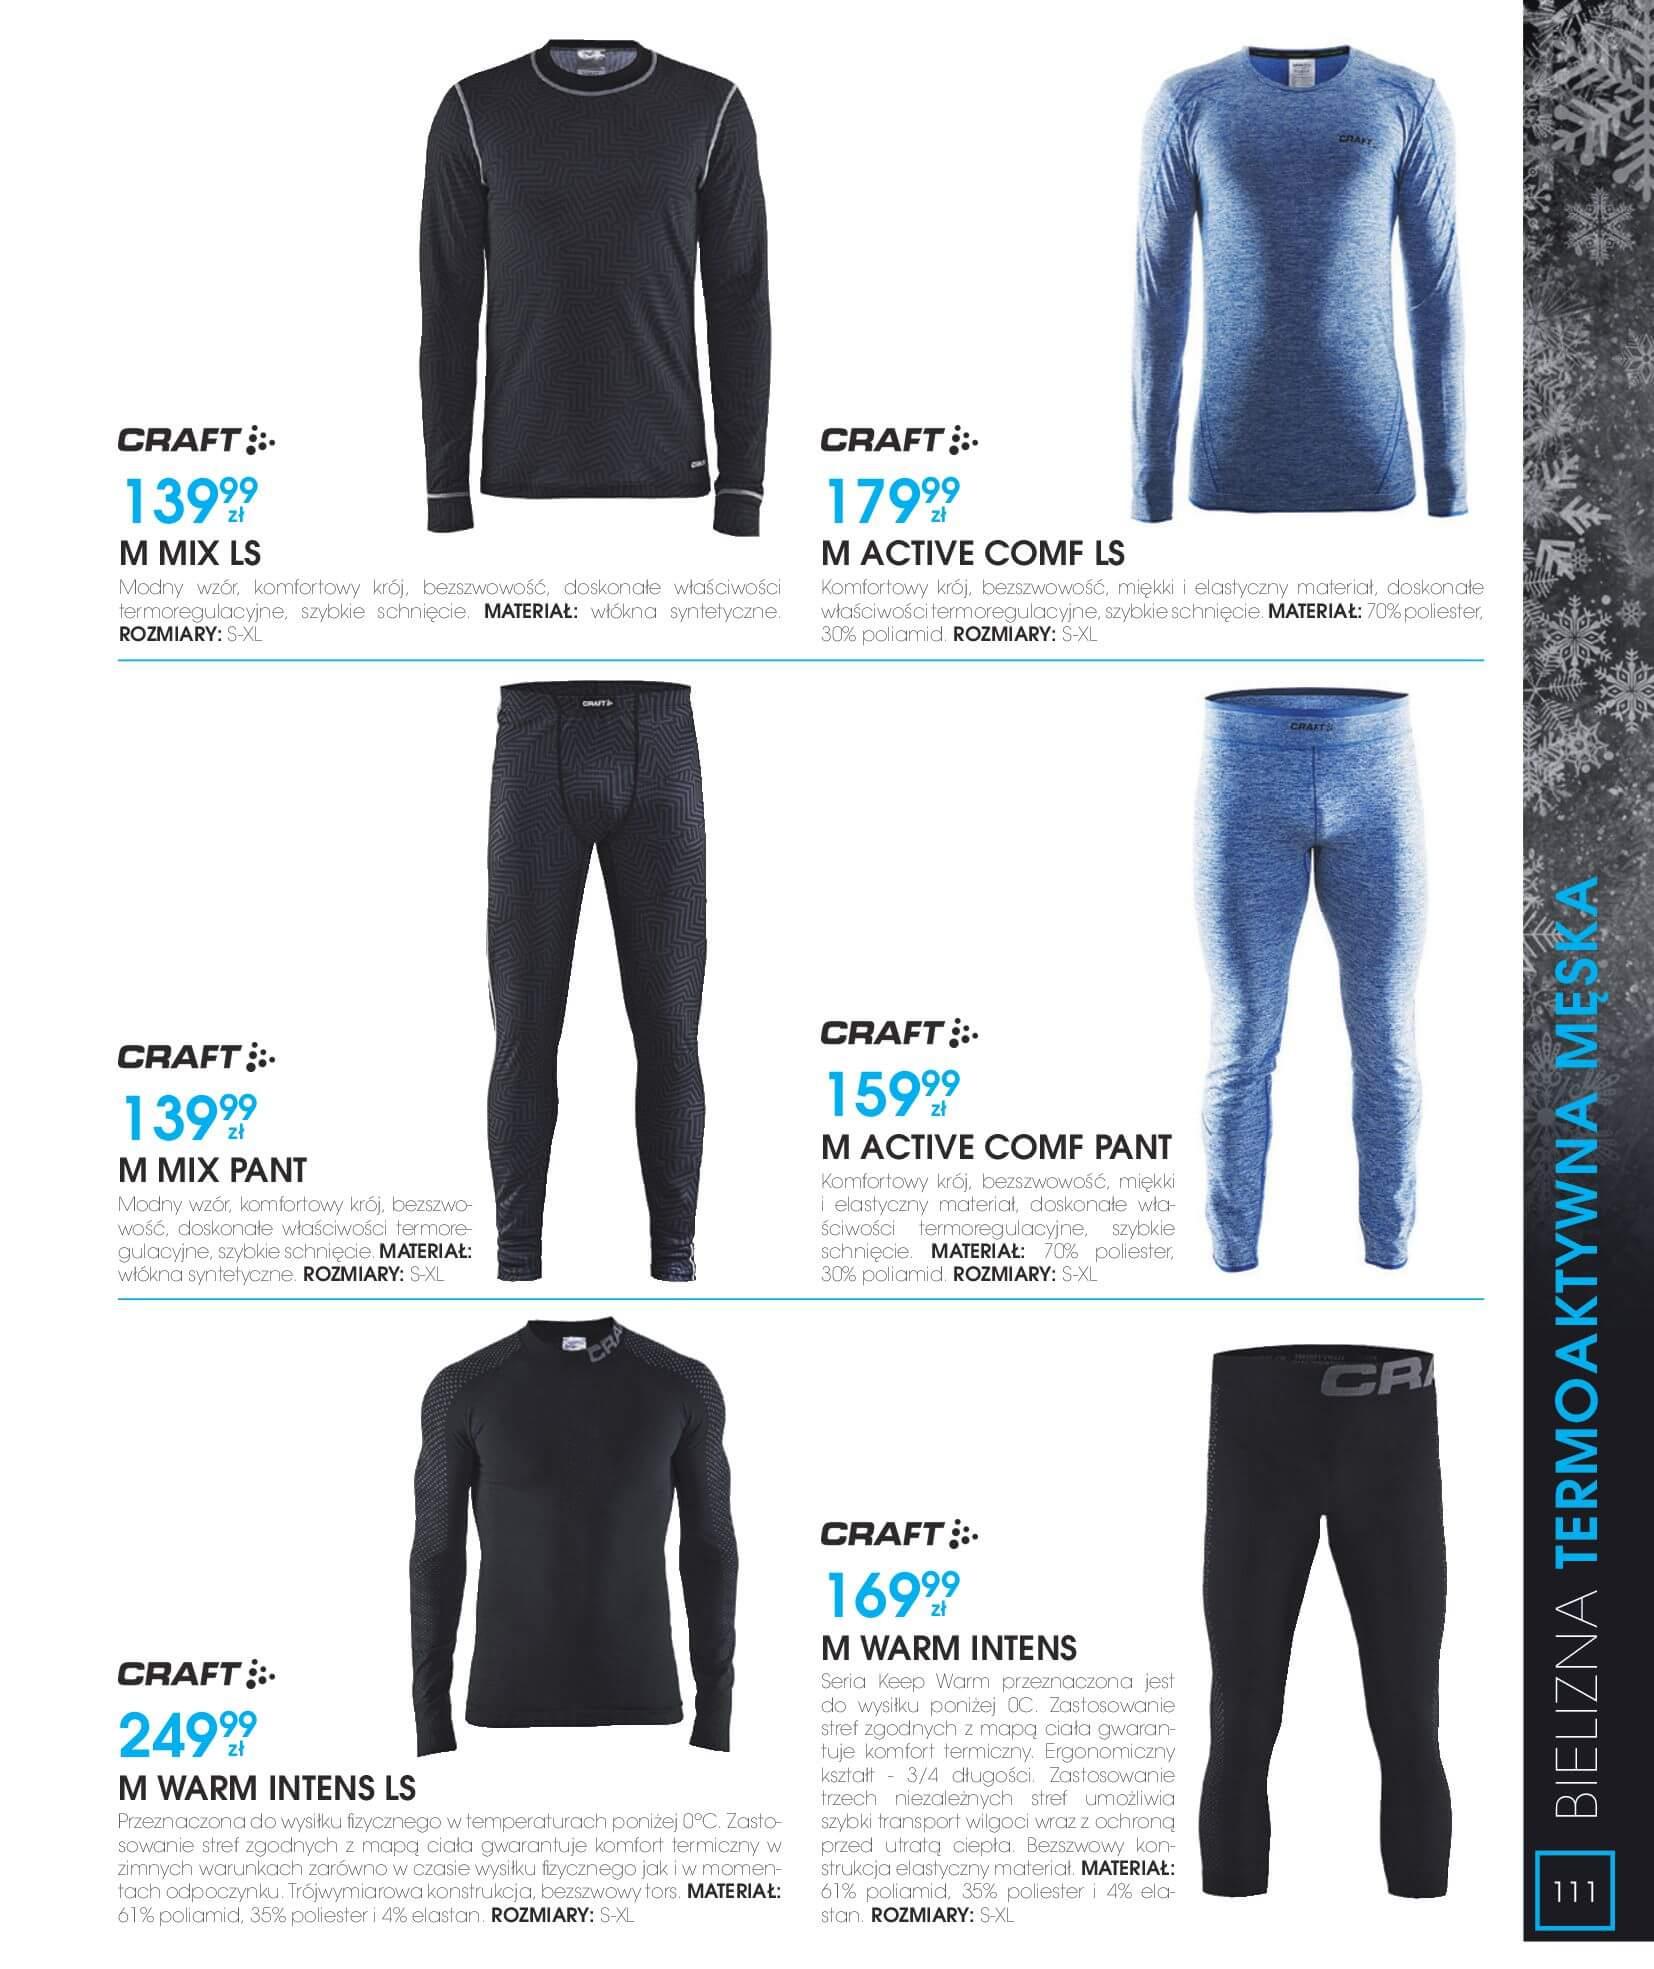 Gazetka Go Sport - Katalog Zima 2017/2018-12.11.2017-28.02.2018-page-111